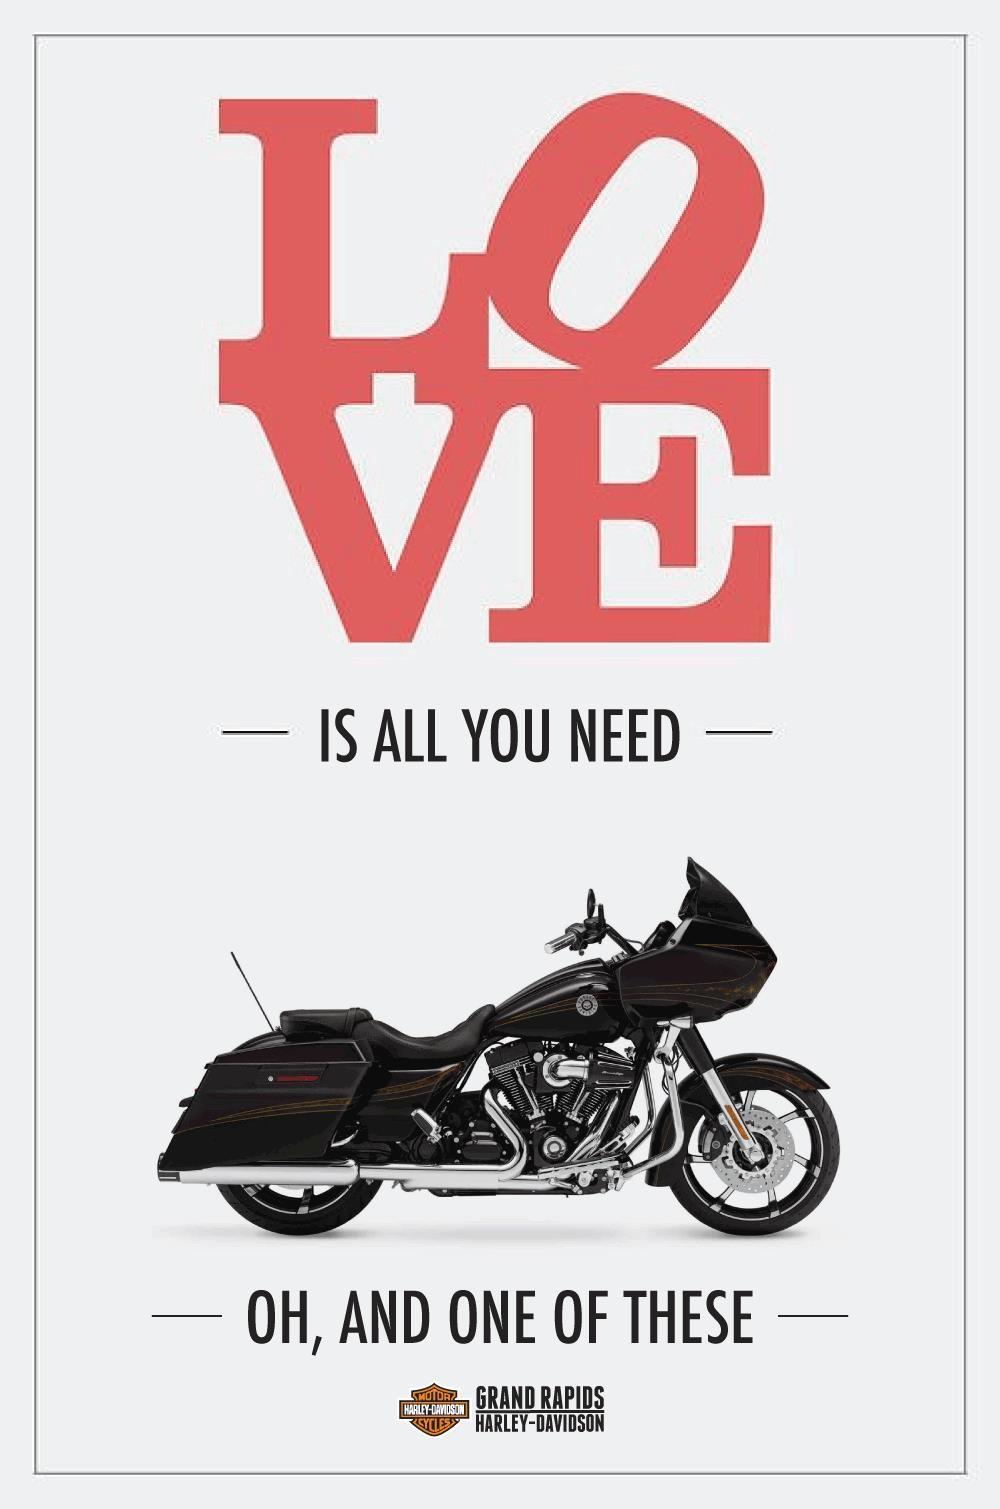 All you need harley harley davidson harley davidson bikes